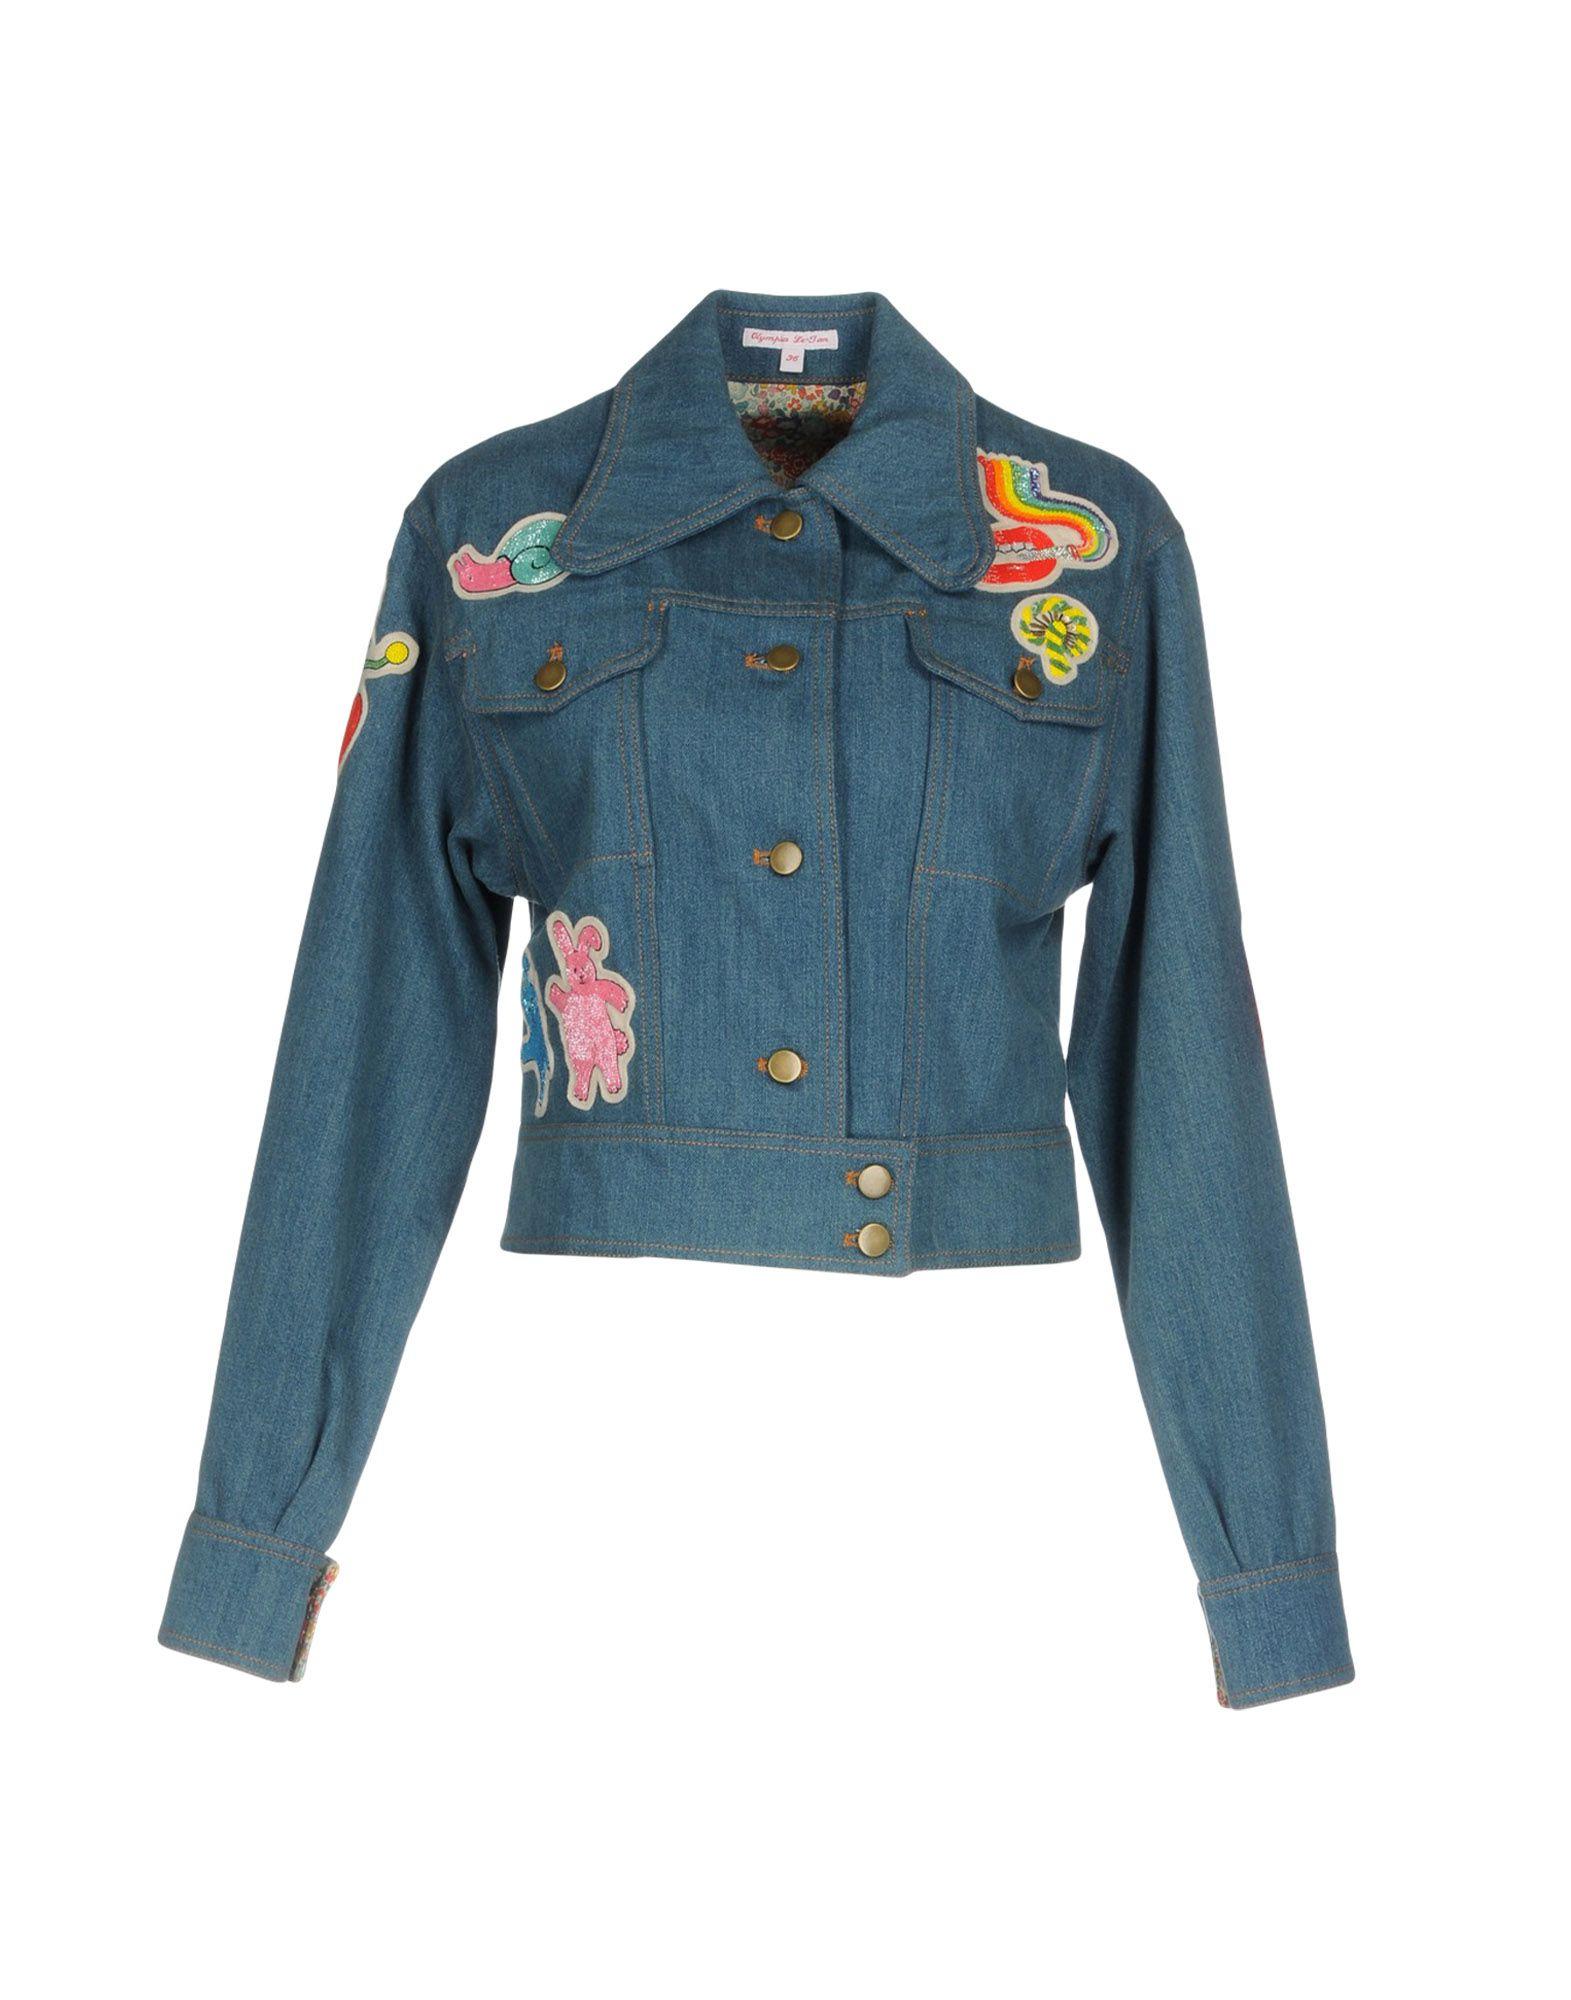 цена на OLYMPIA LE-TAN Джинсовая верхняя одежда